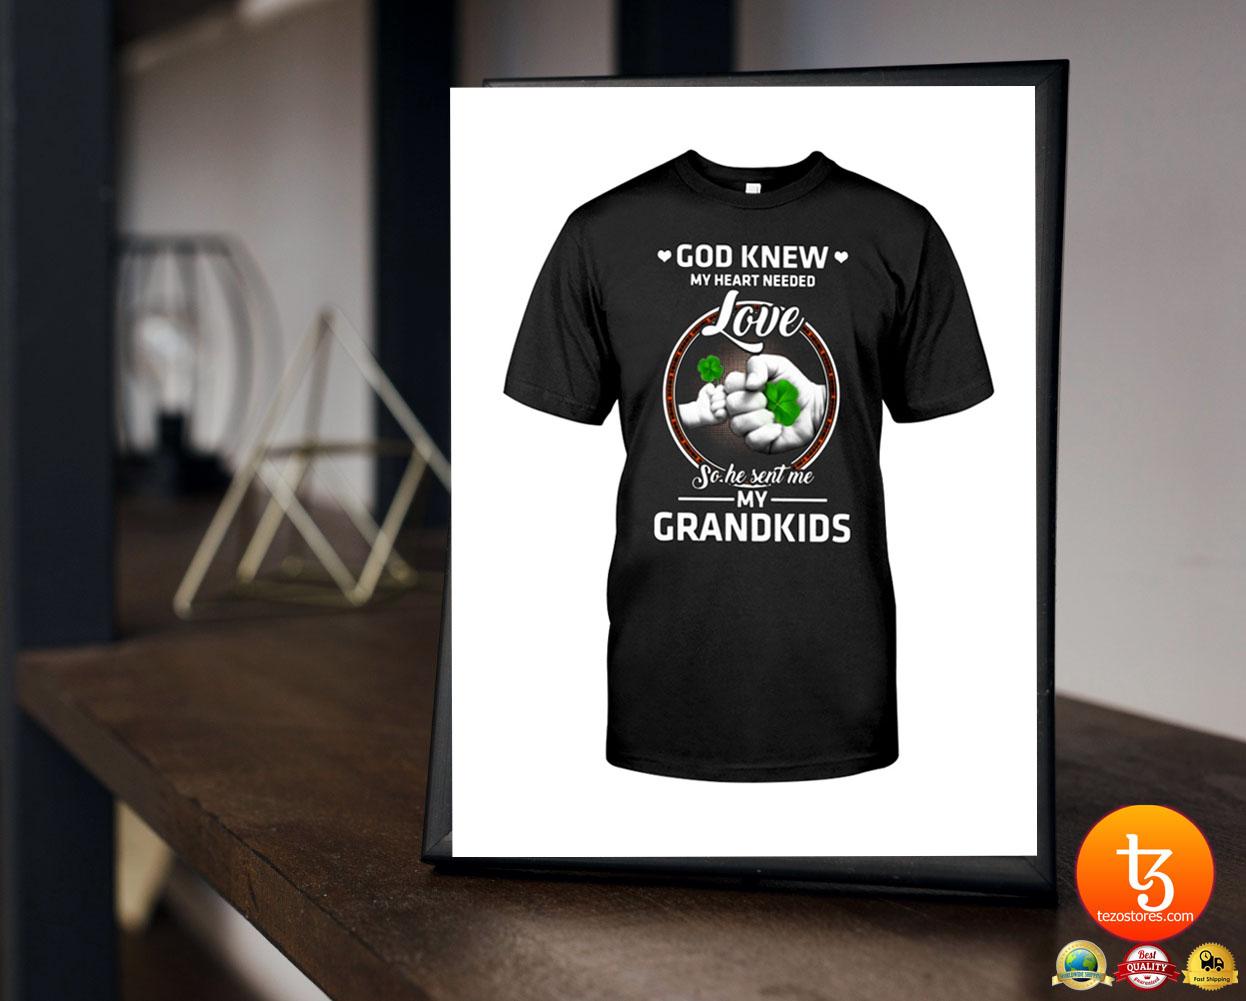 Irish God knew me heart needed love so he sent me my grandkids shirt